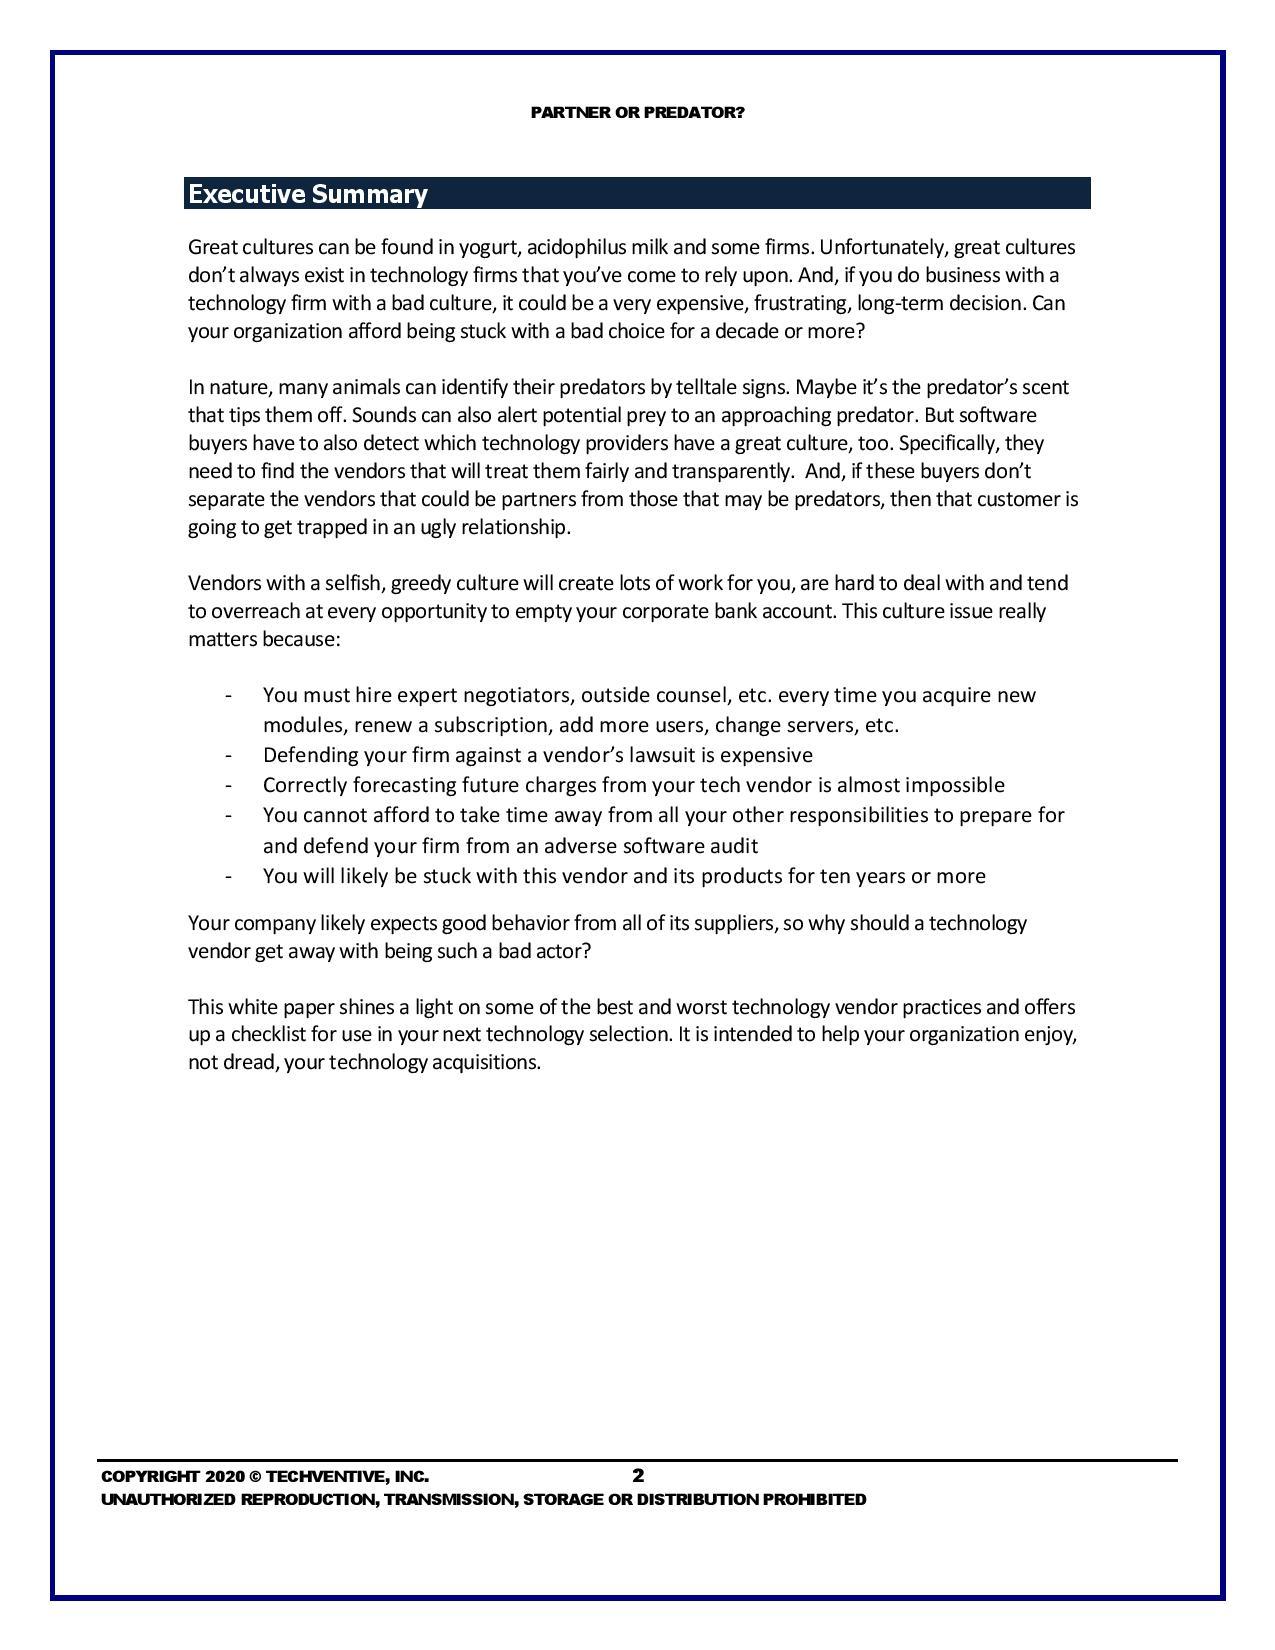 ERP Vendor Selection: Find a Partner, Not a Predator, page 1